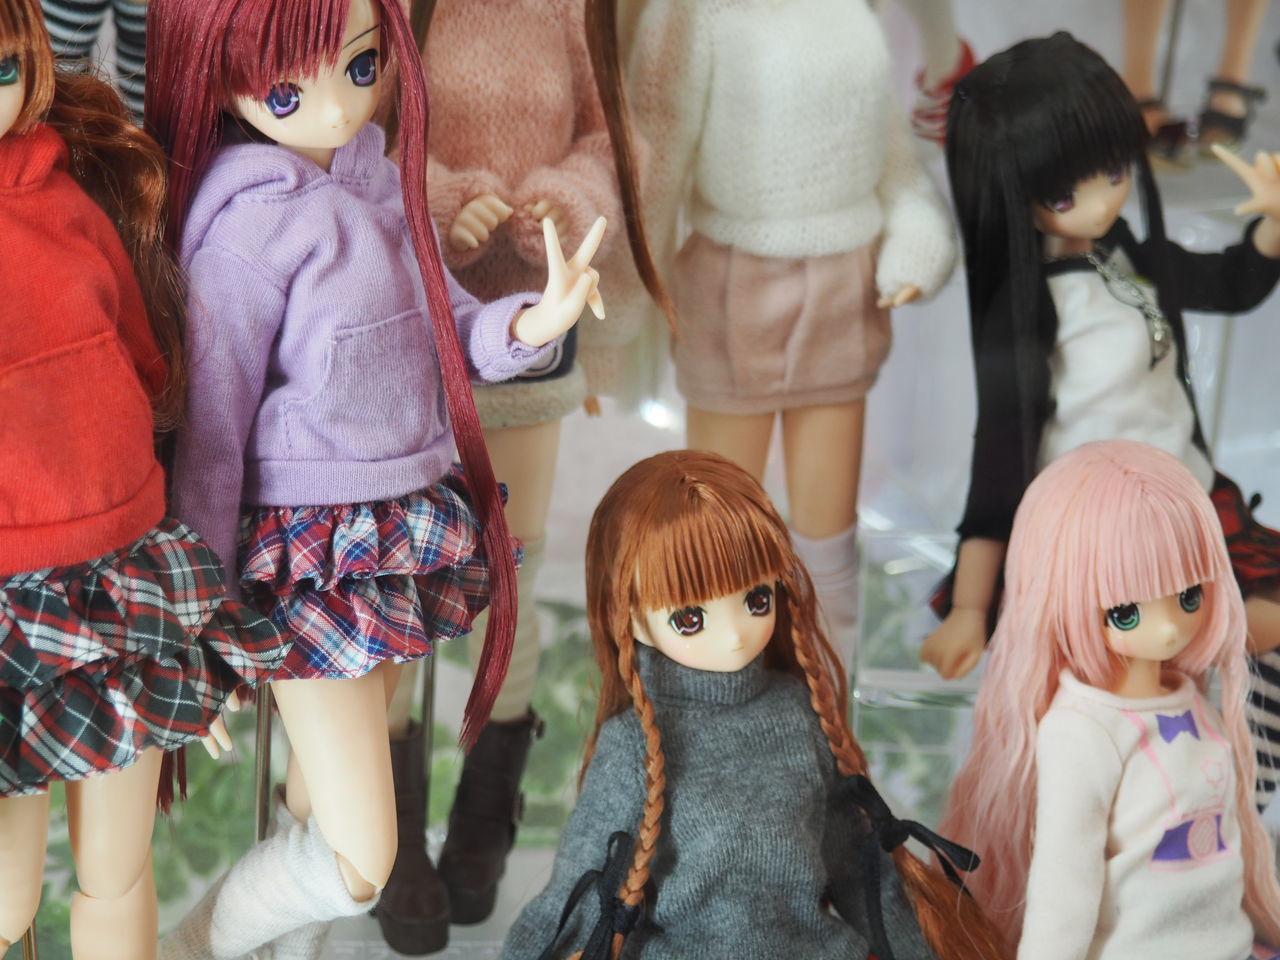 Childhood Day Doll Doll Dolls Fashion Girls Human Representation Indoors  Japanese  Japanese Culture Long Hair Manga Medium Group Of People Retail  Women